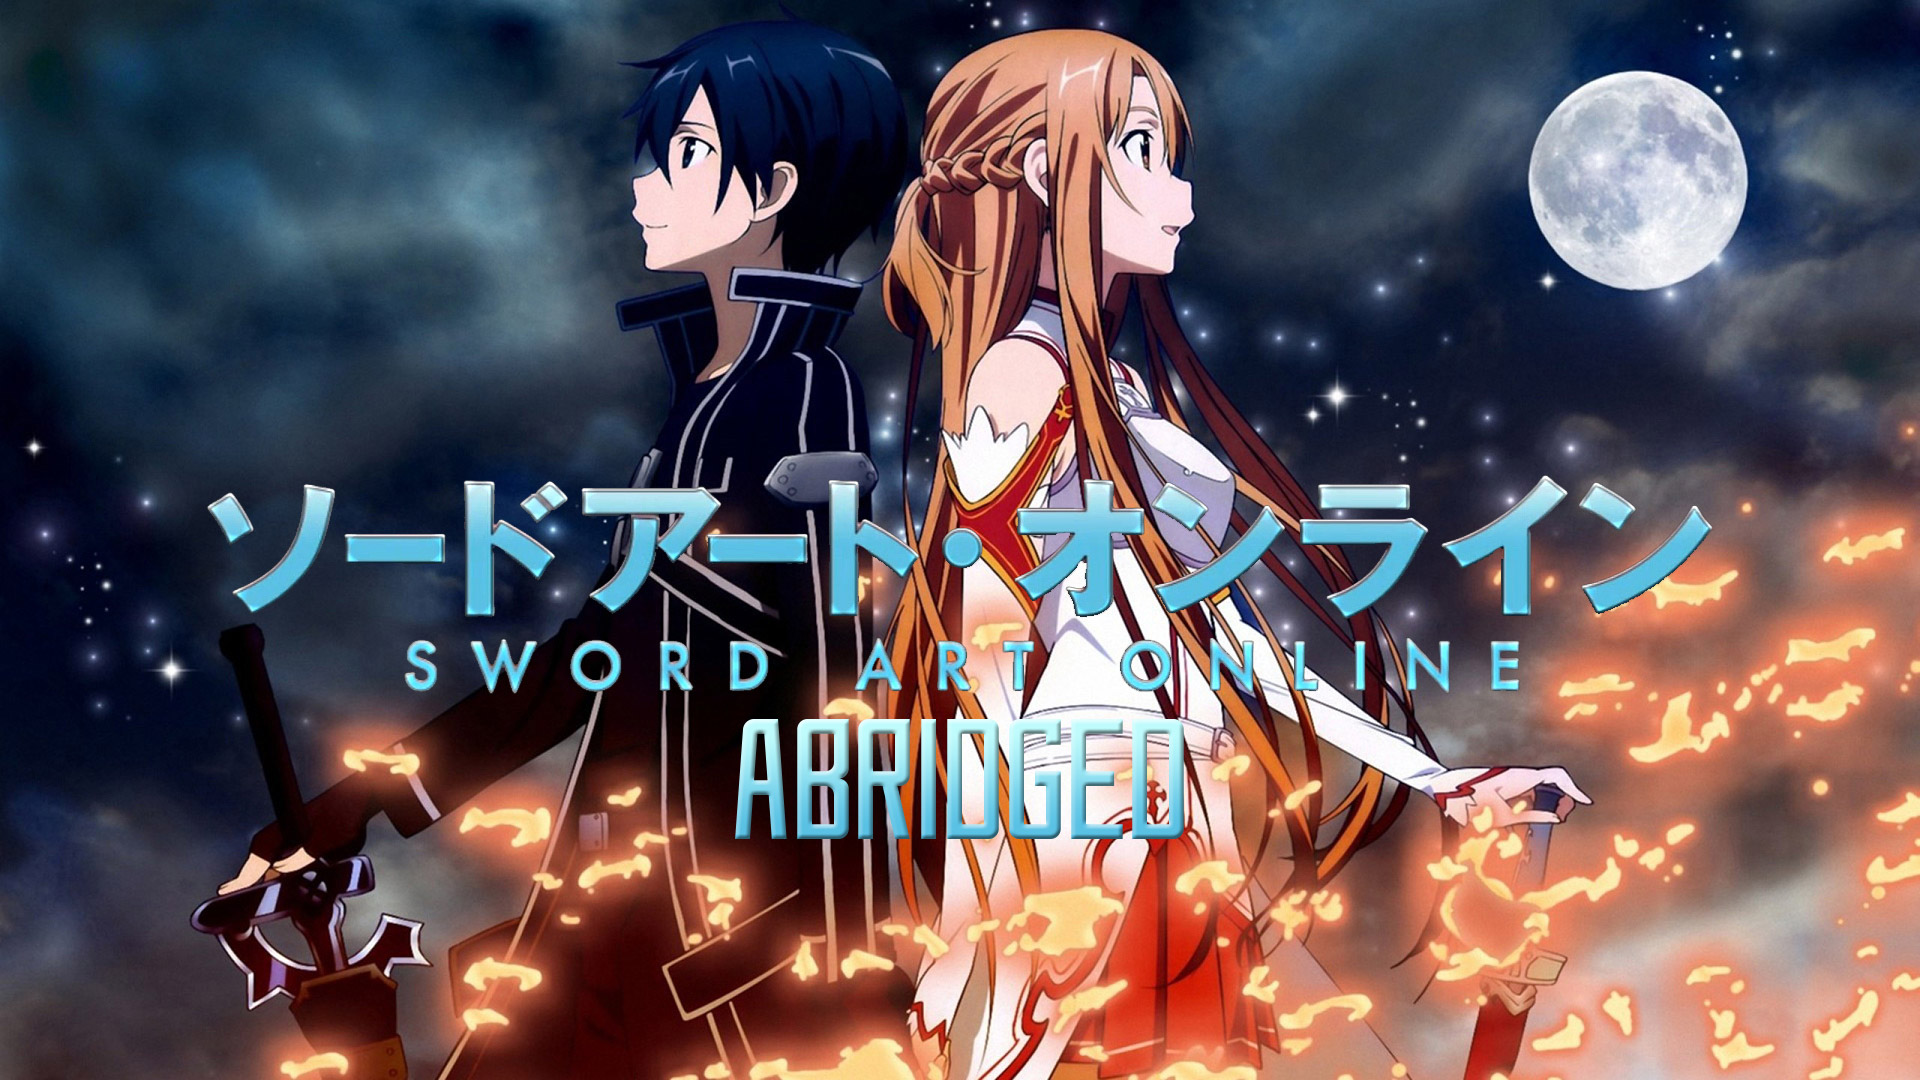 Sword art online season 2 air date in Sydney